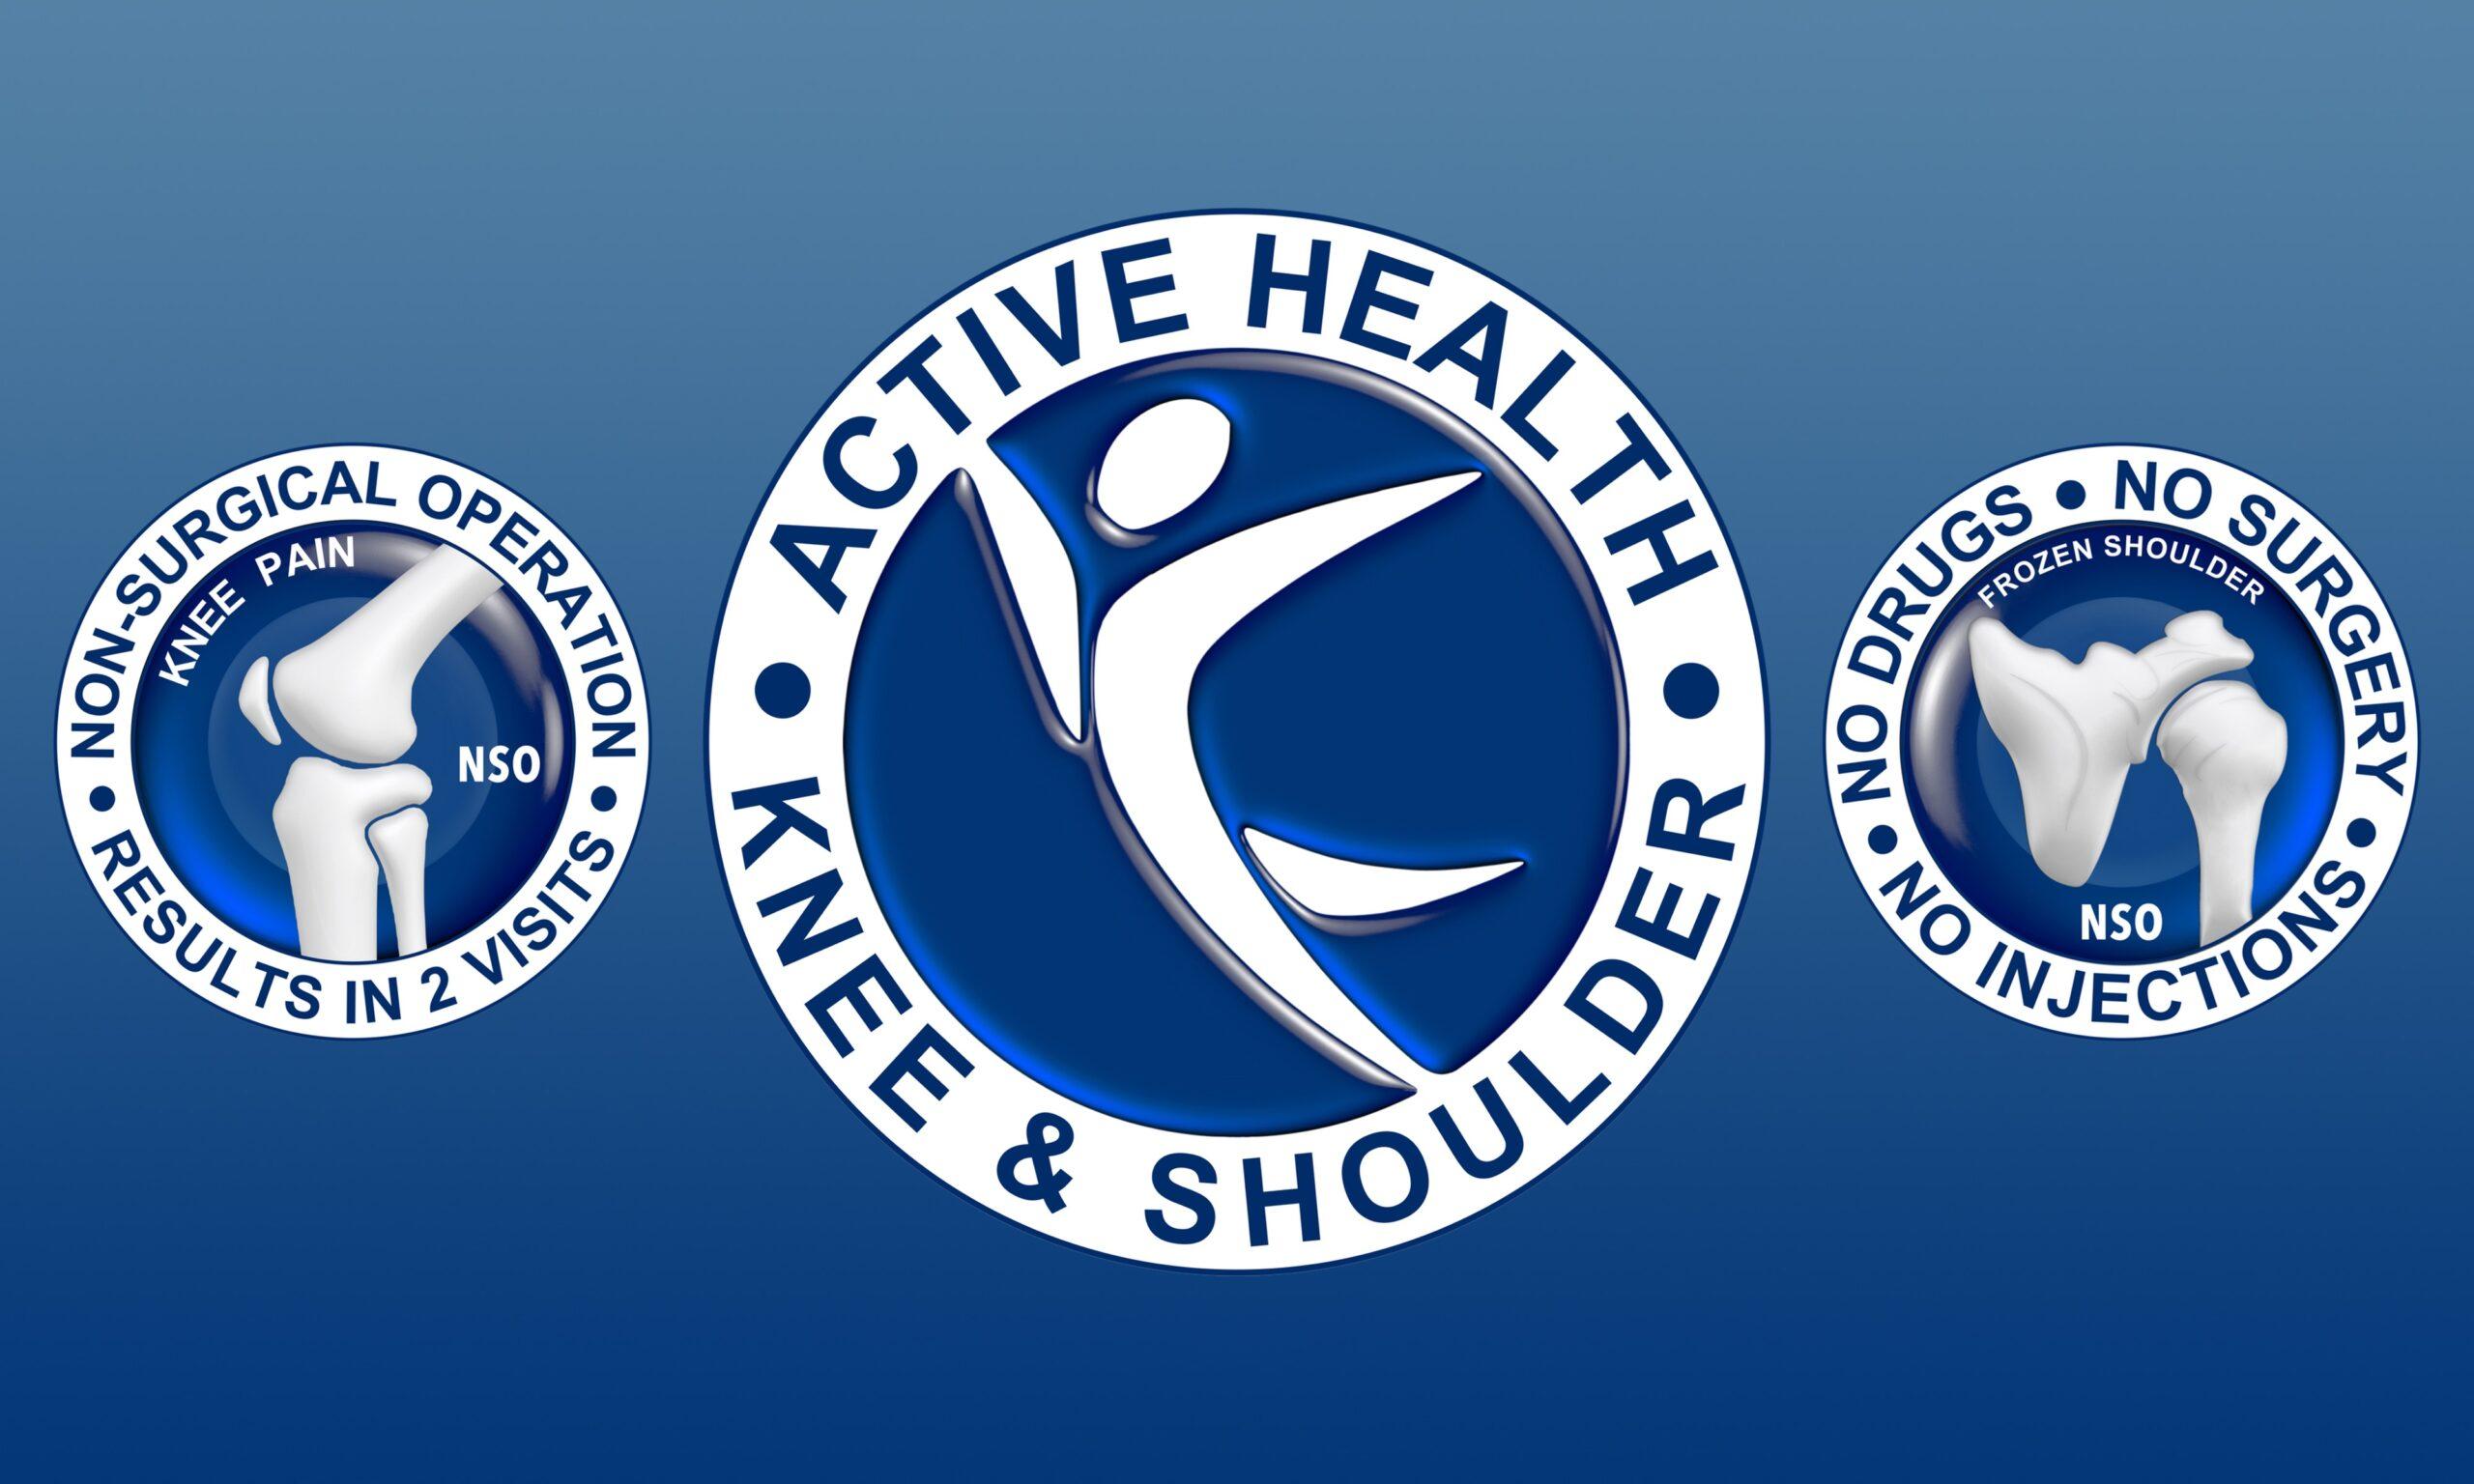 Active Health Knee and Shoulder